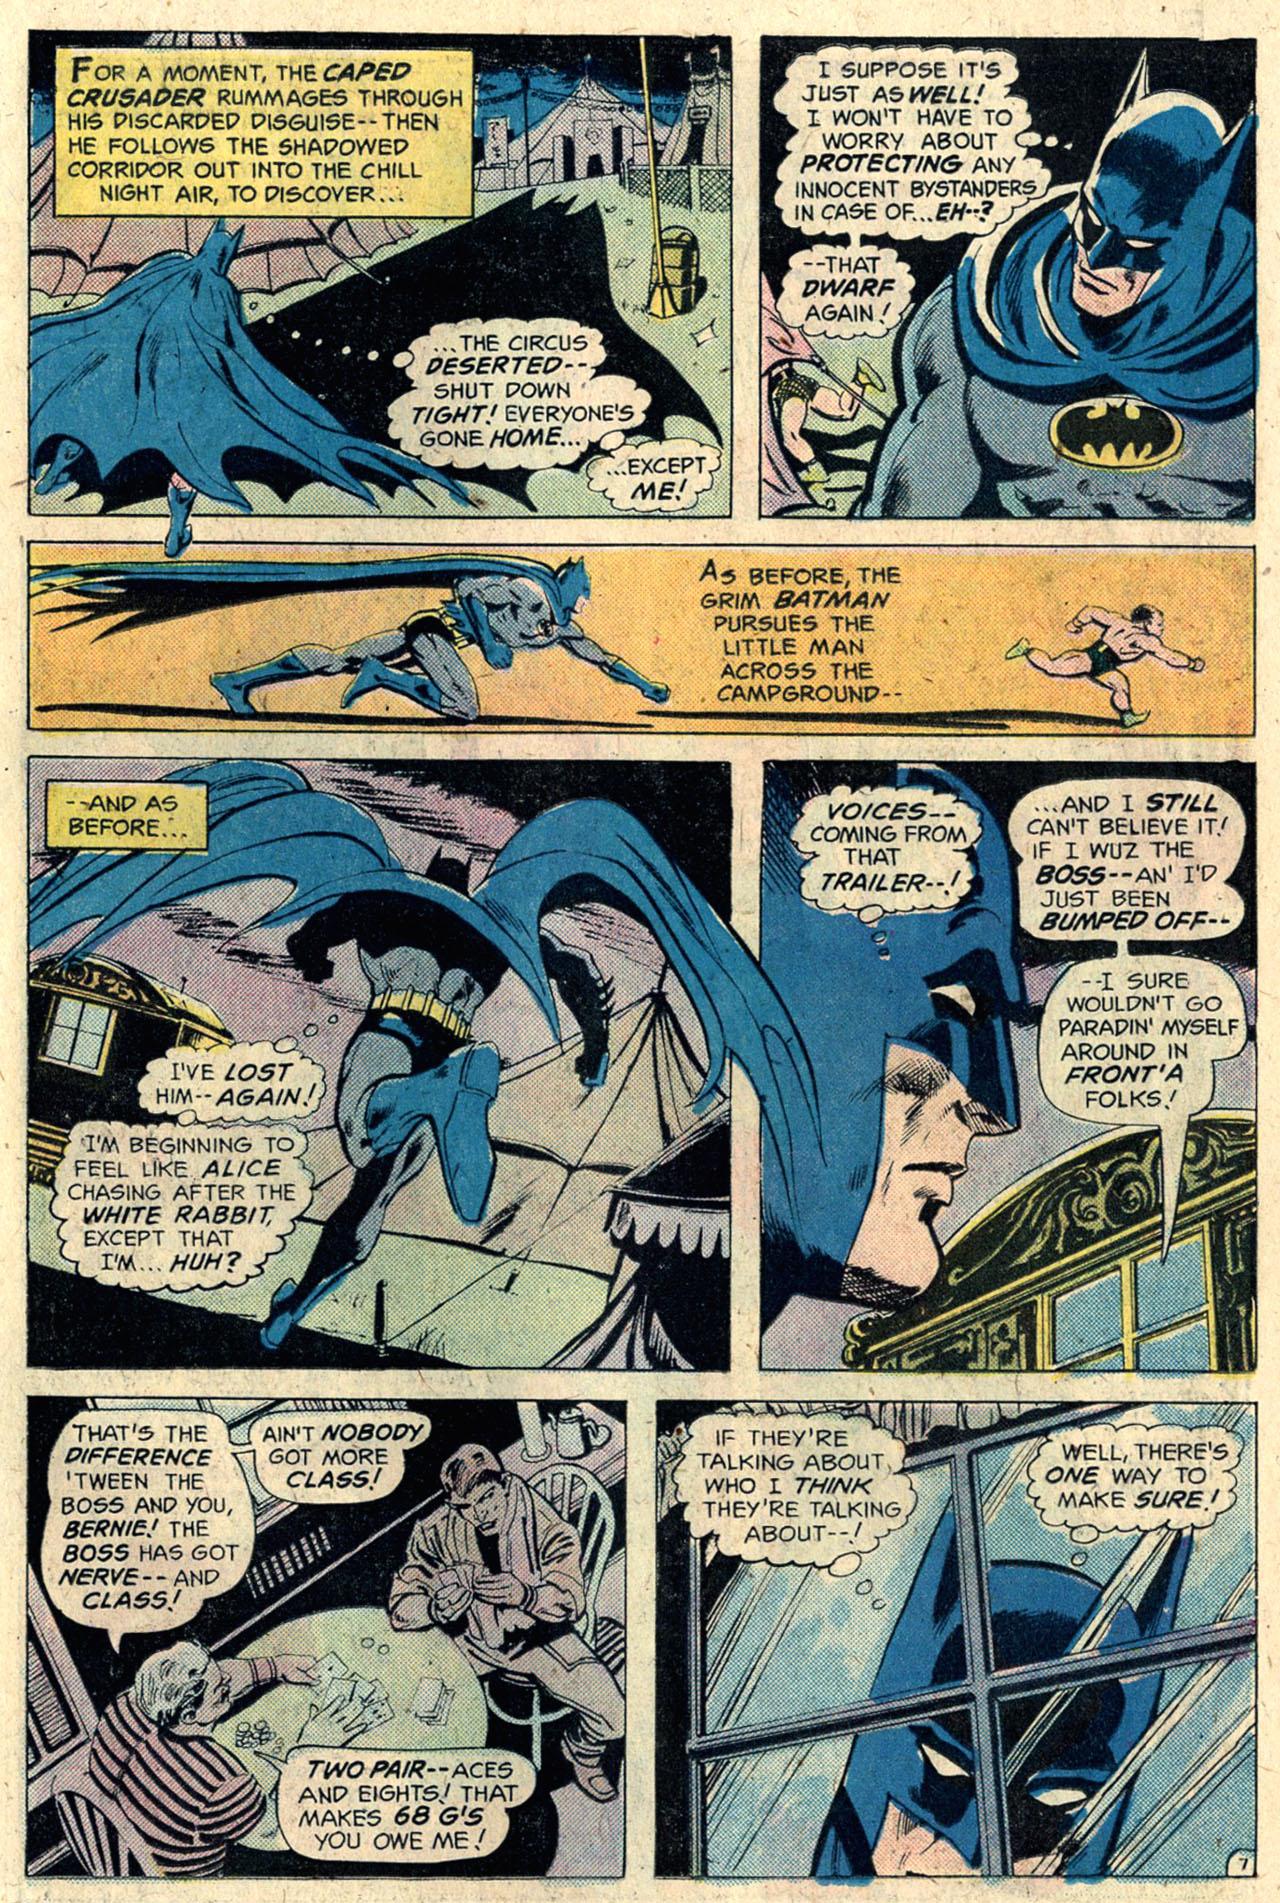 Detective Comics (1937) 448 Page 10